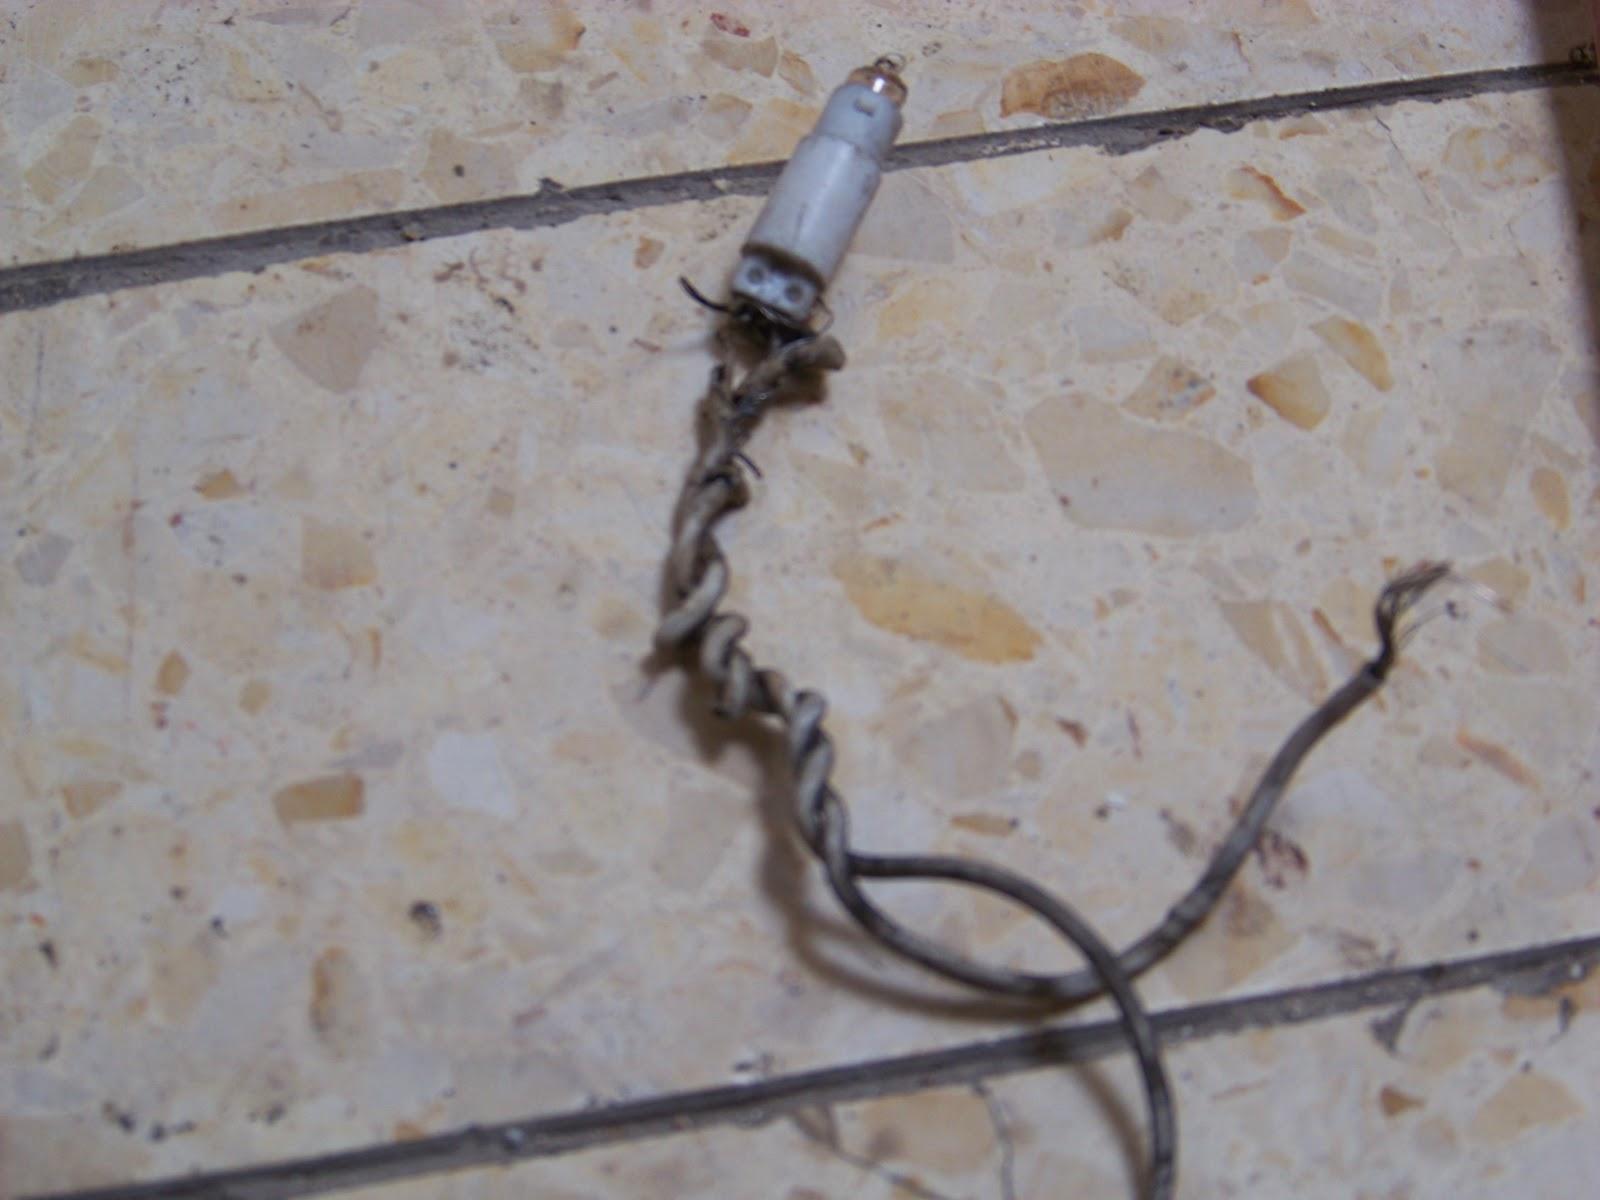 Frayed Extension Cord : Making aliyah january